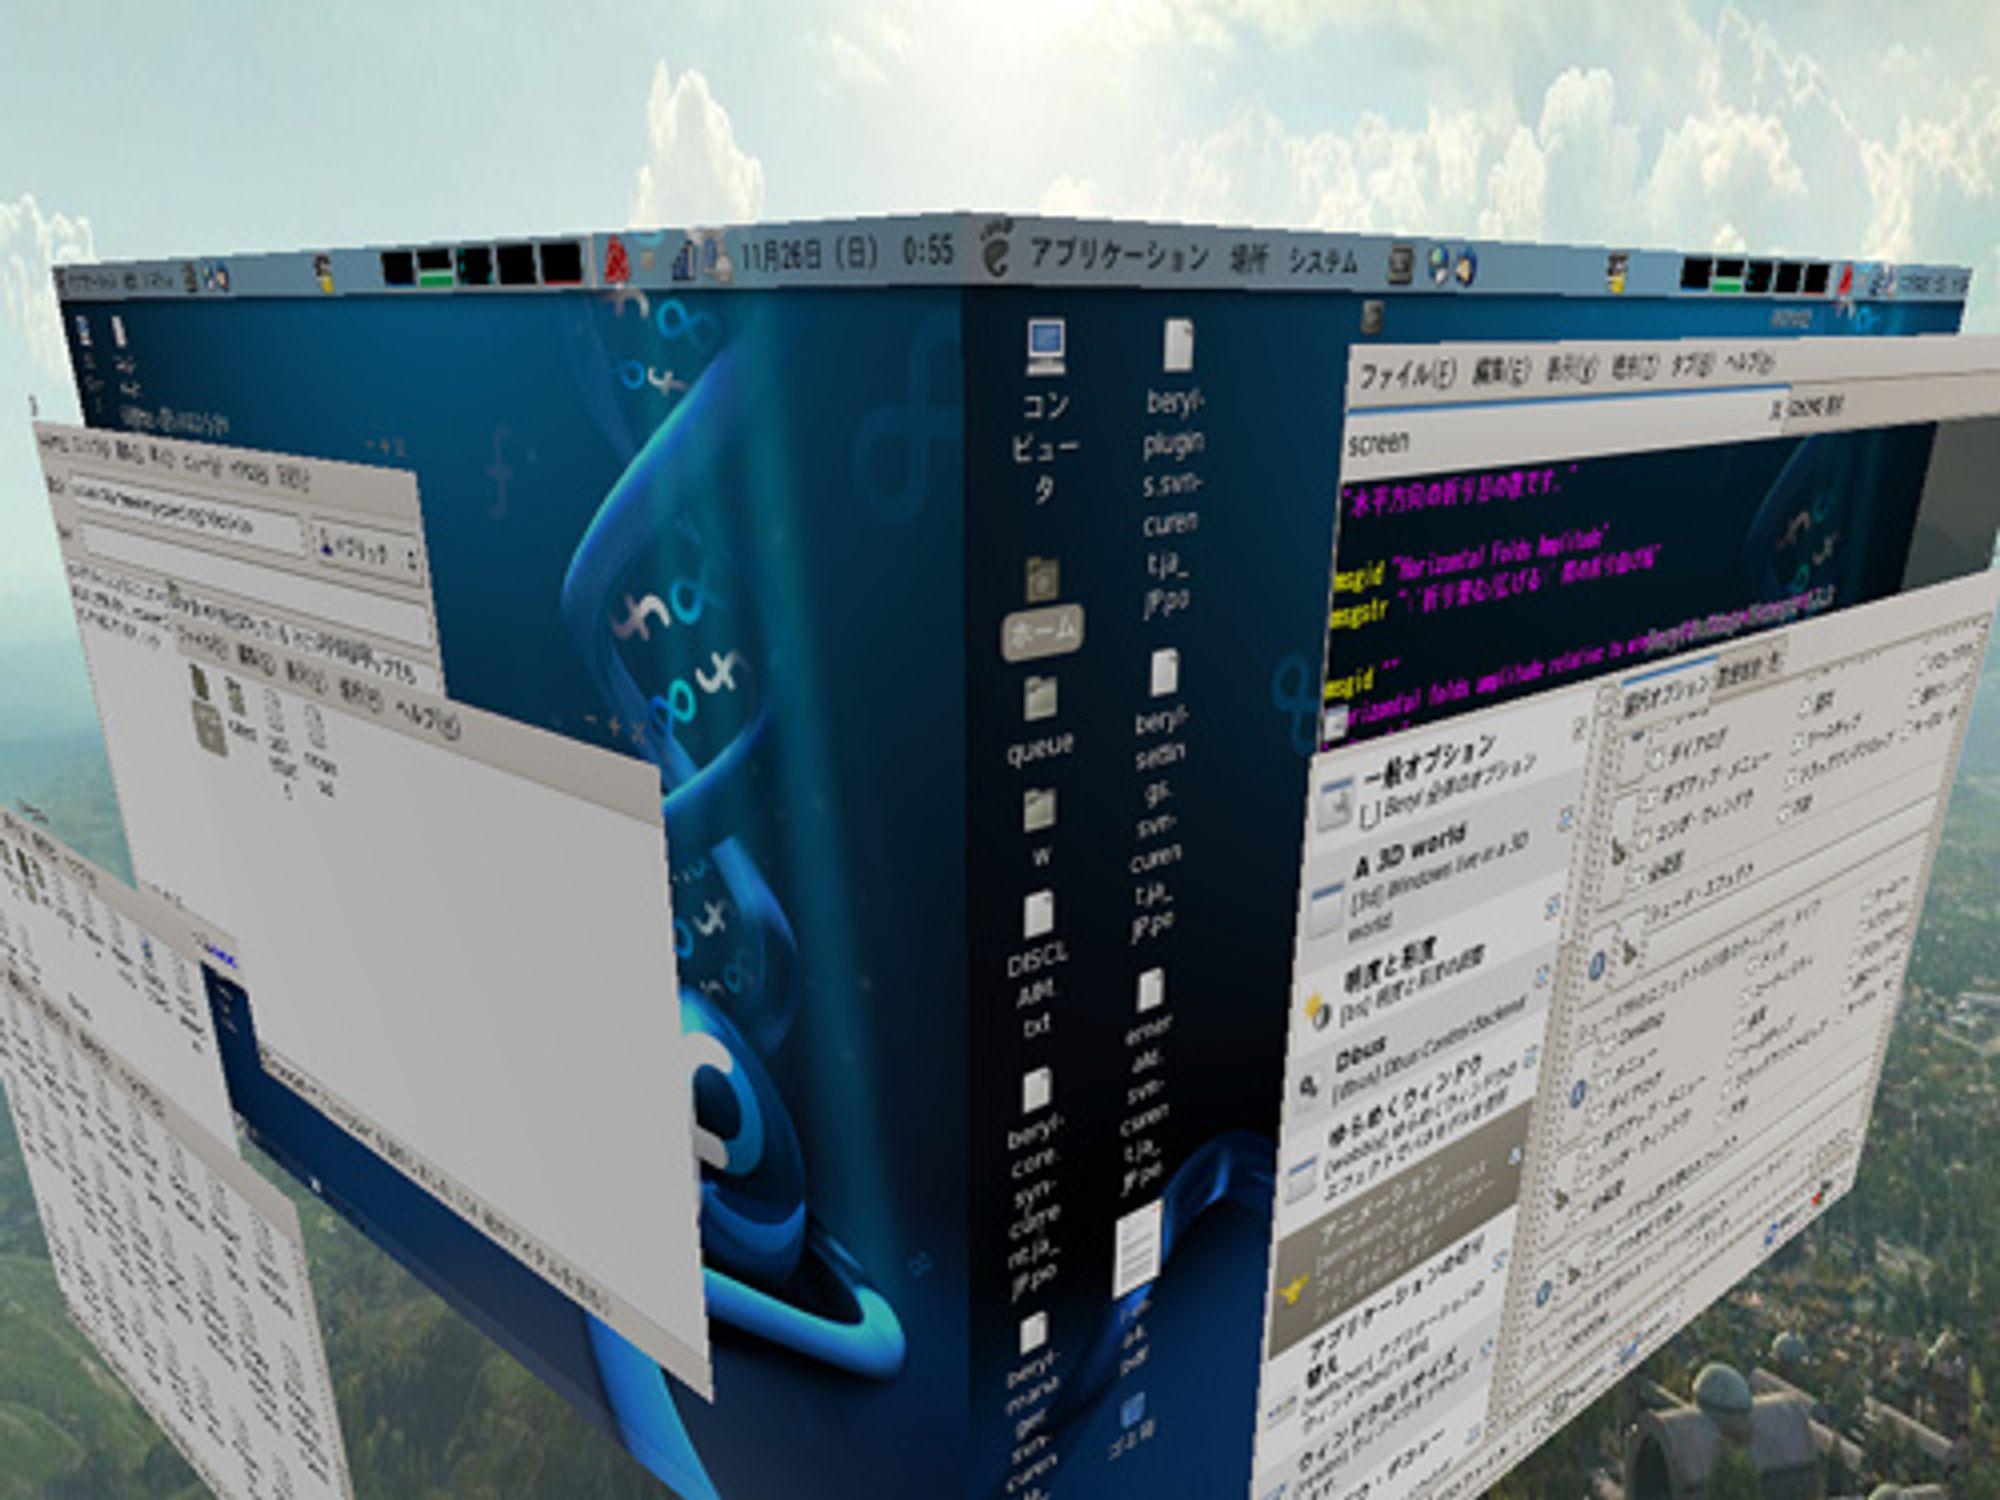 Compiz kuben med 3d plugin